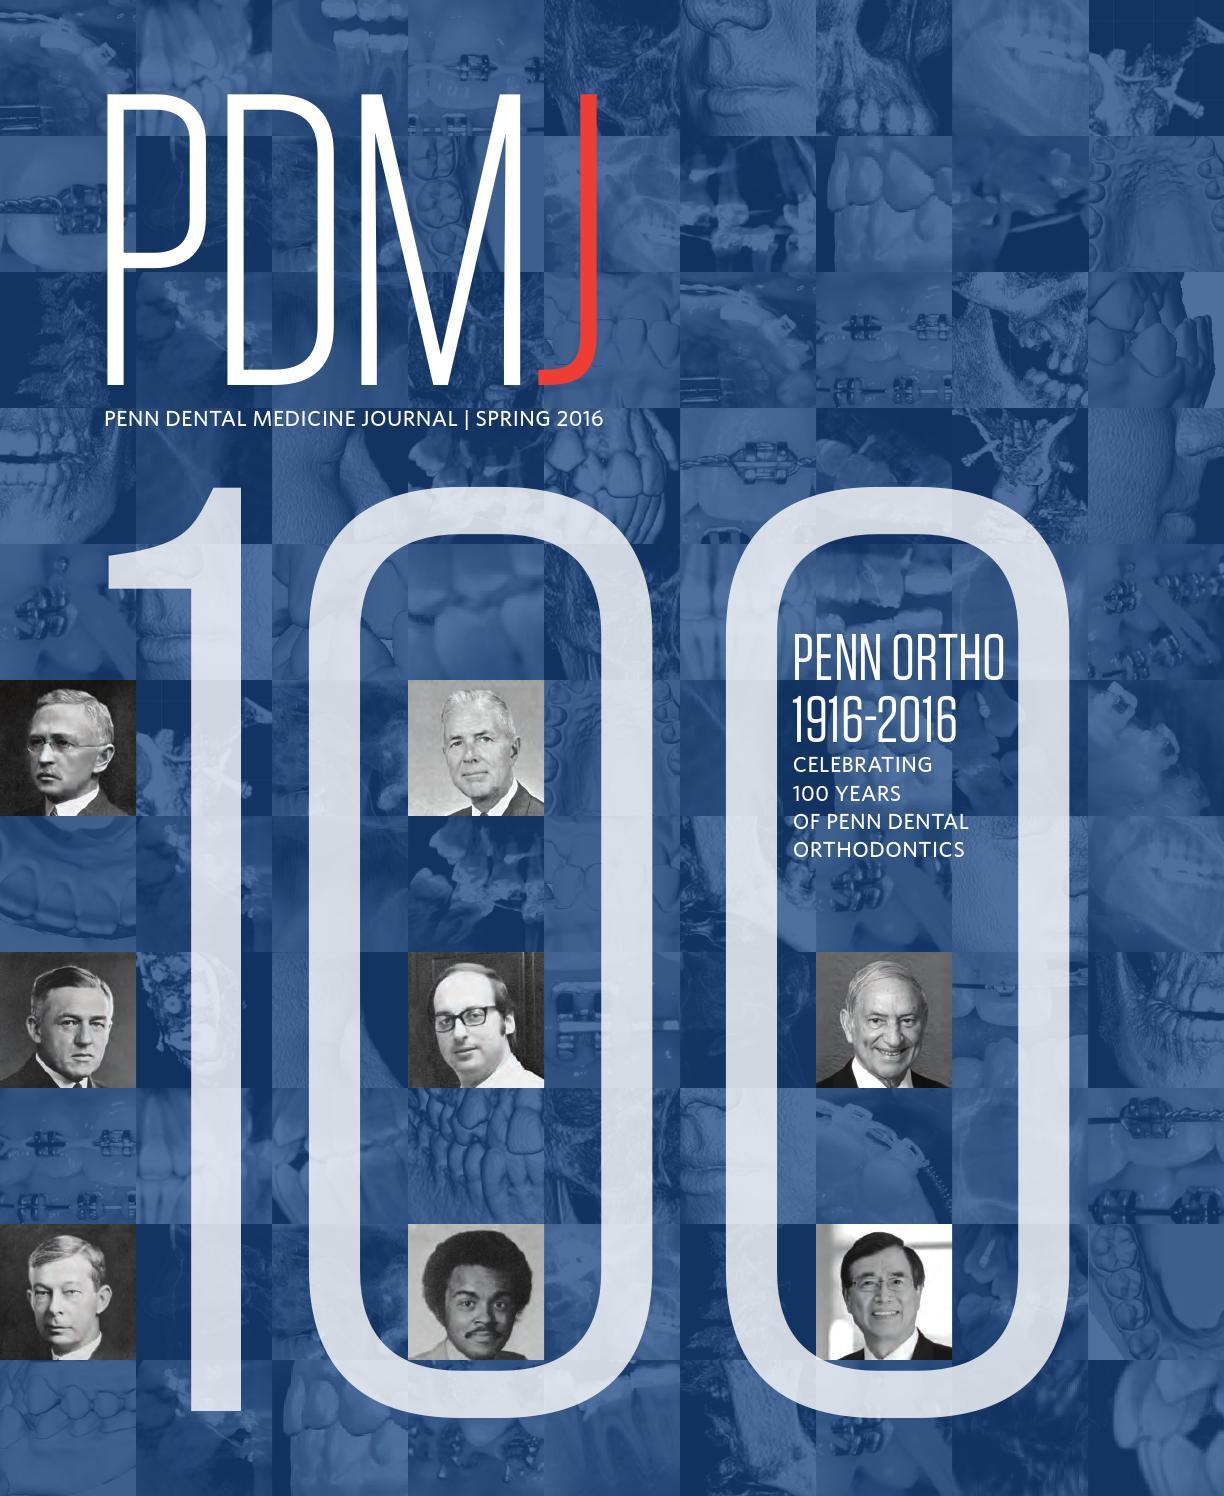 Penn Dental Medicine Journal, Spring 2016 by Penn Dental Medicine